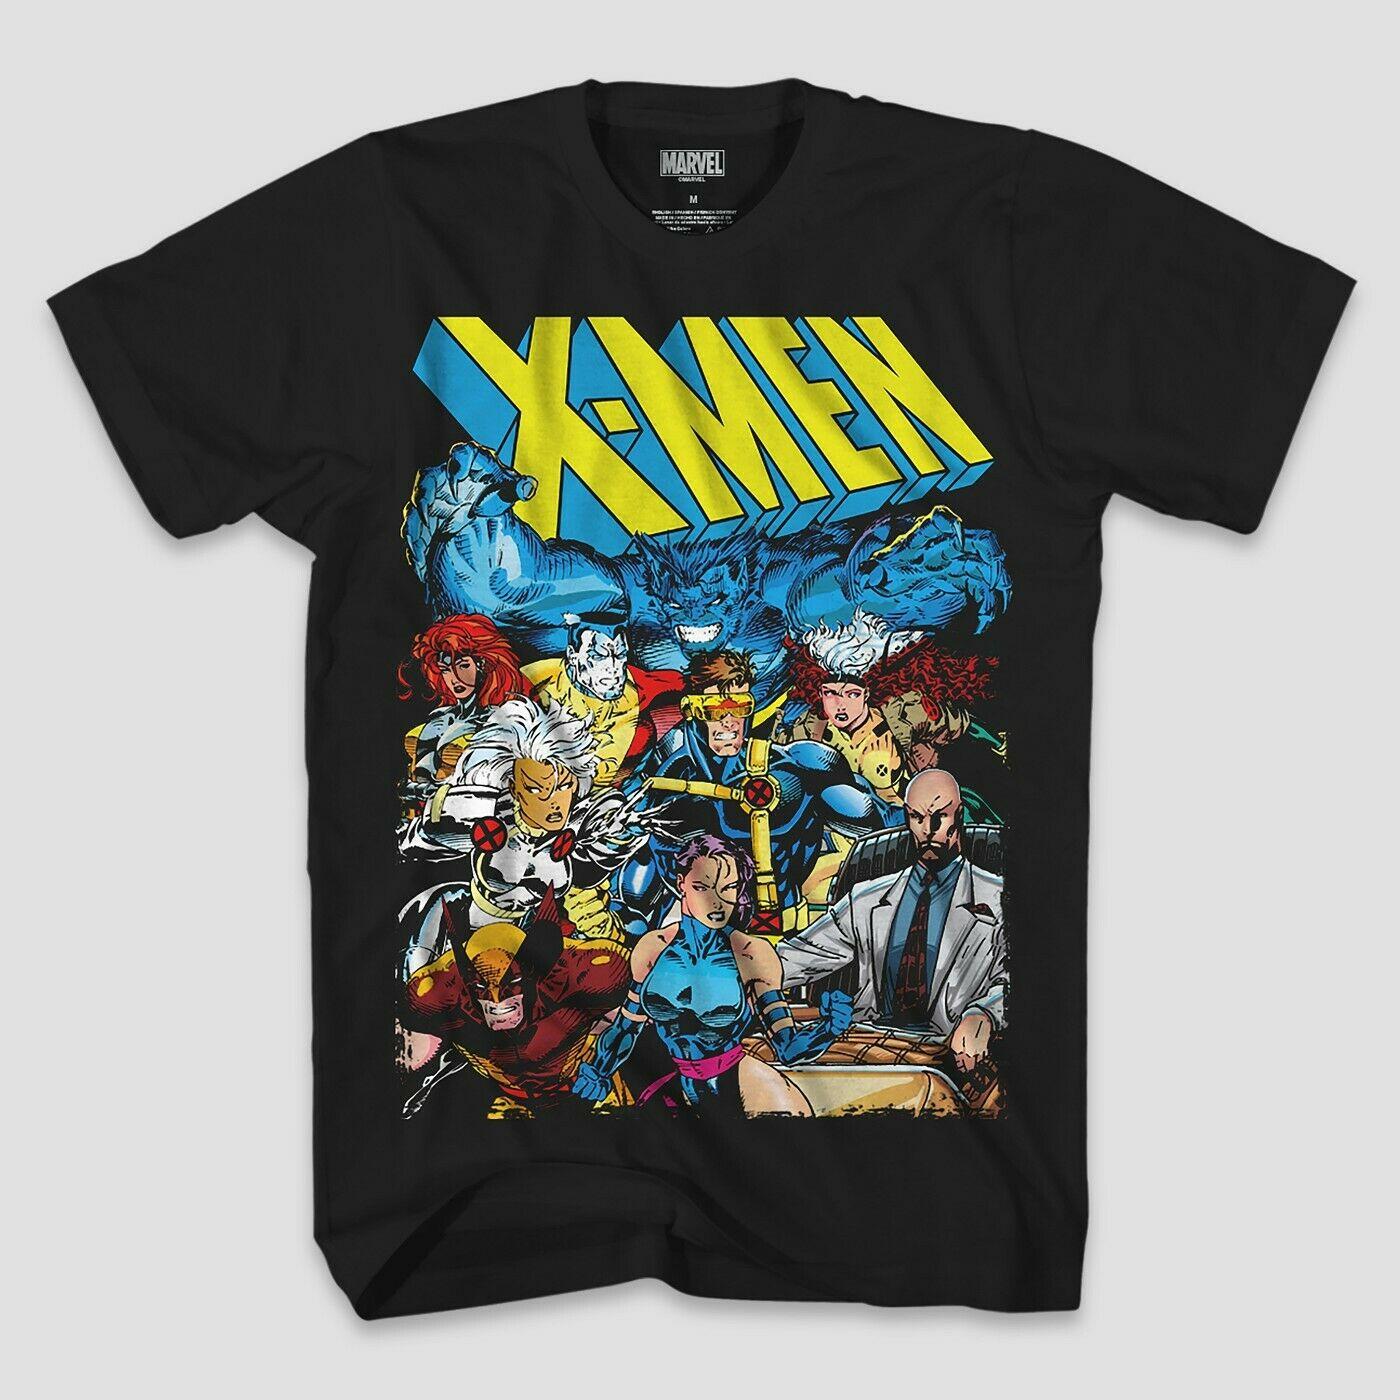 X-men Marvel Comics Gambit White Tees Men/'s T-Shirt Regular Size S-3XL